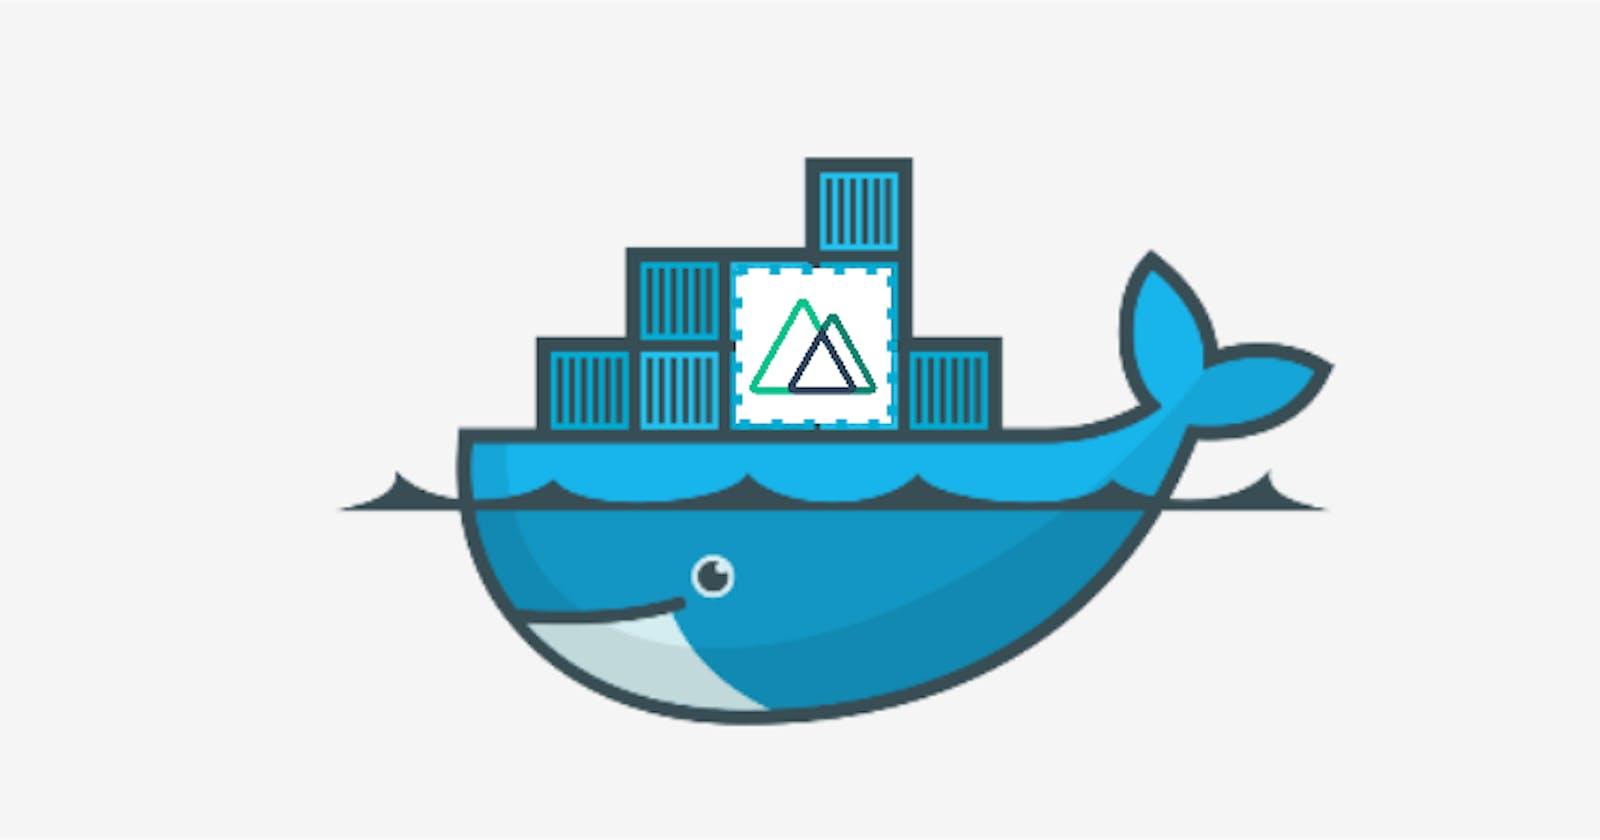 Dockerizing and Deploying Nuxt.js SSR Apps To AWS ECS